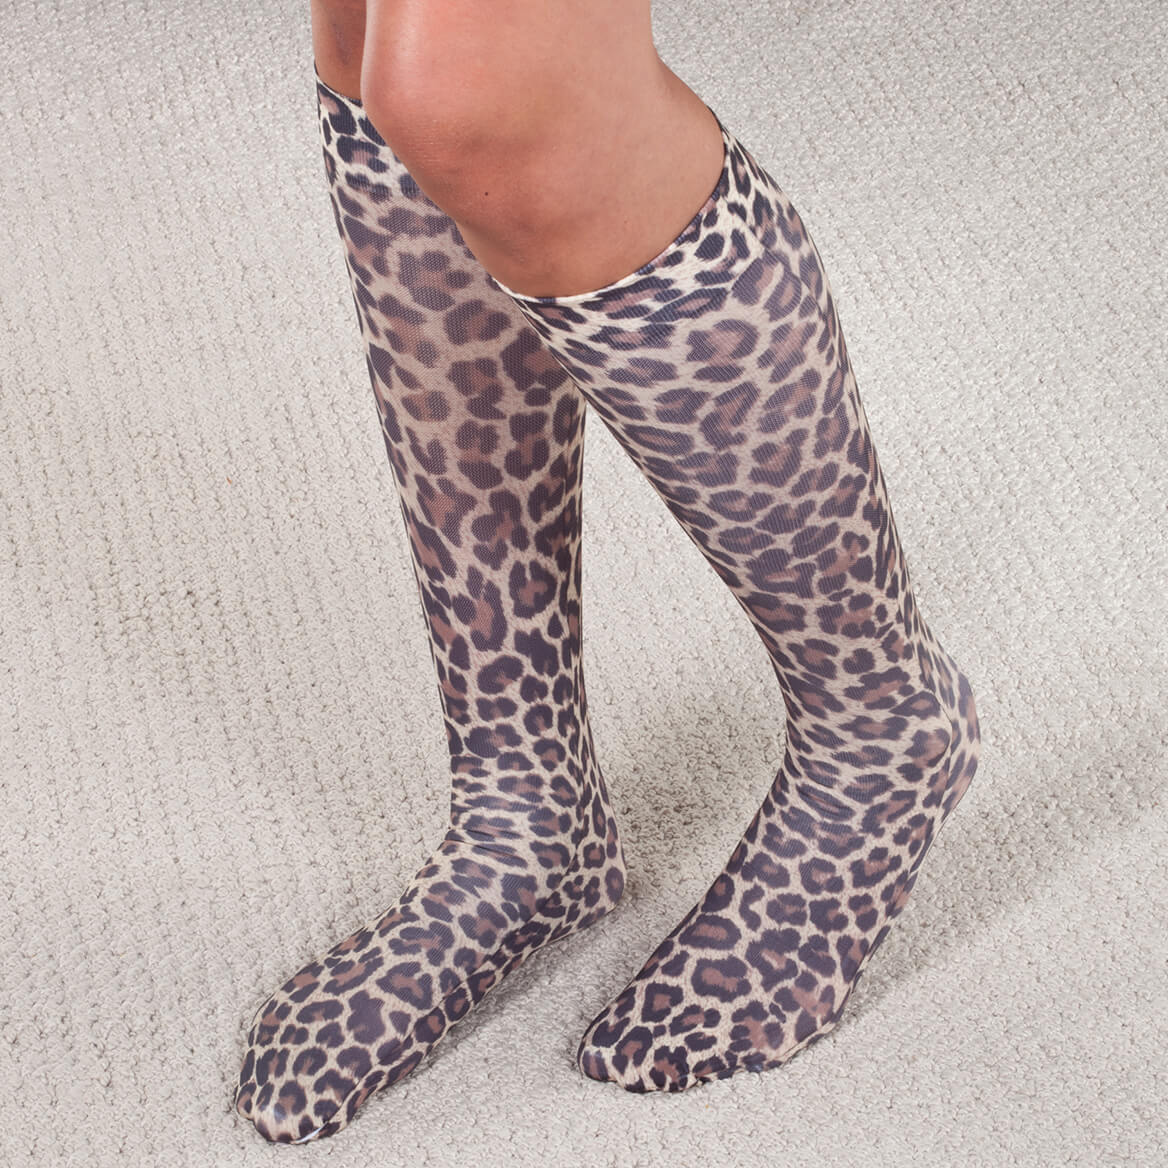 5d30f0f4621 Celeste Stein Compression Socks